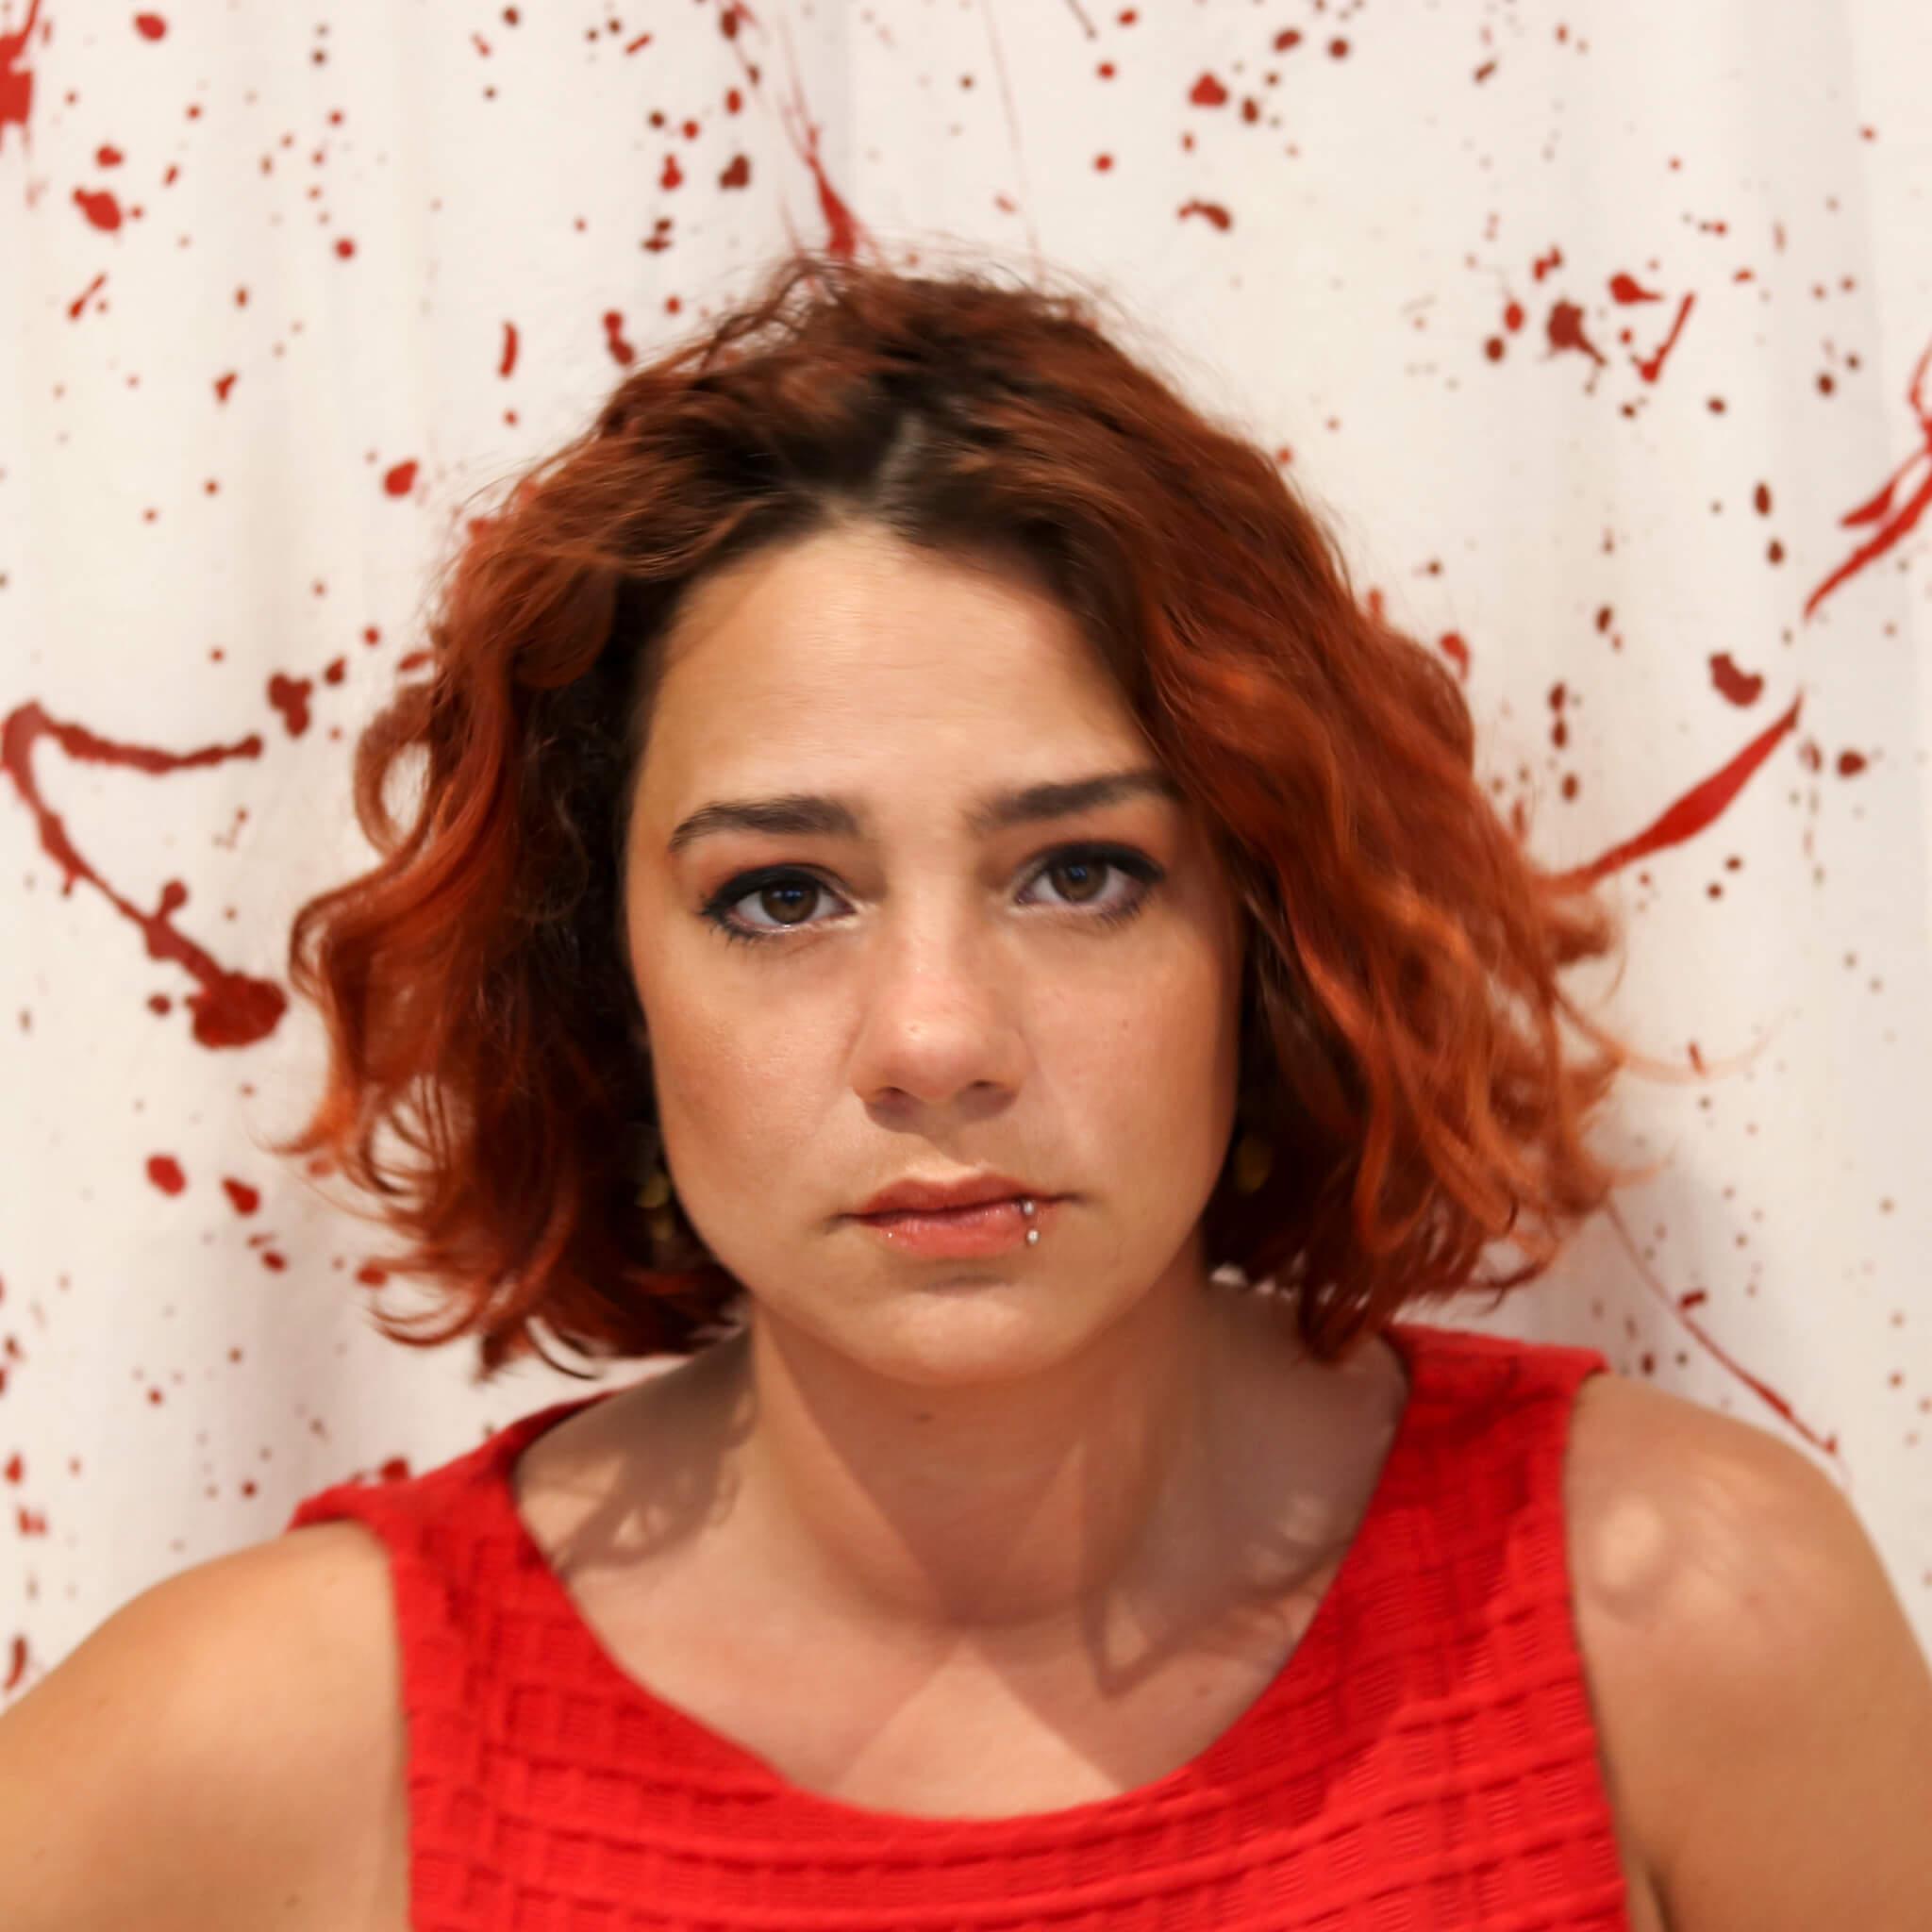 tiny_cosima_montavoci_bloody_portrait.jpg